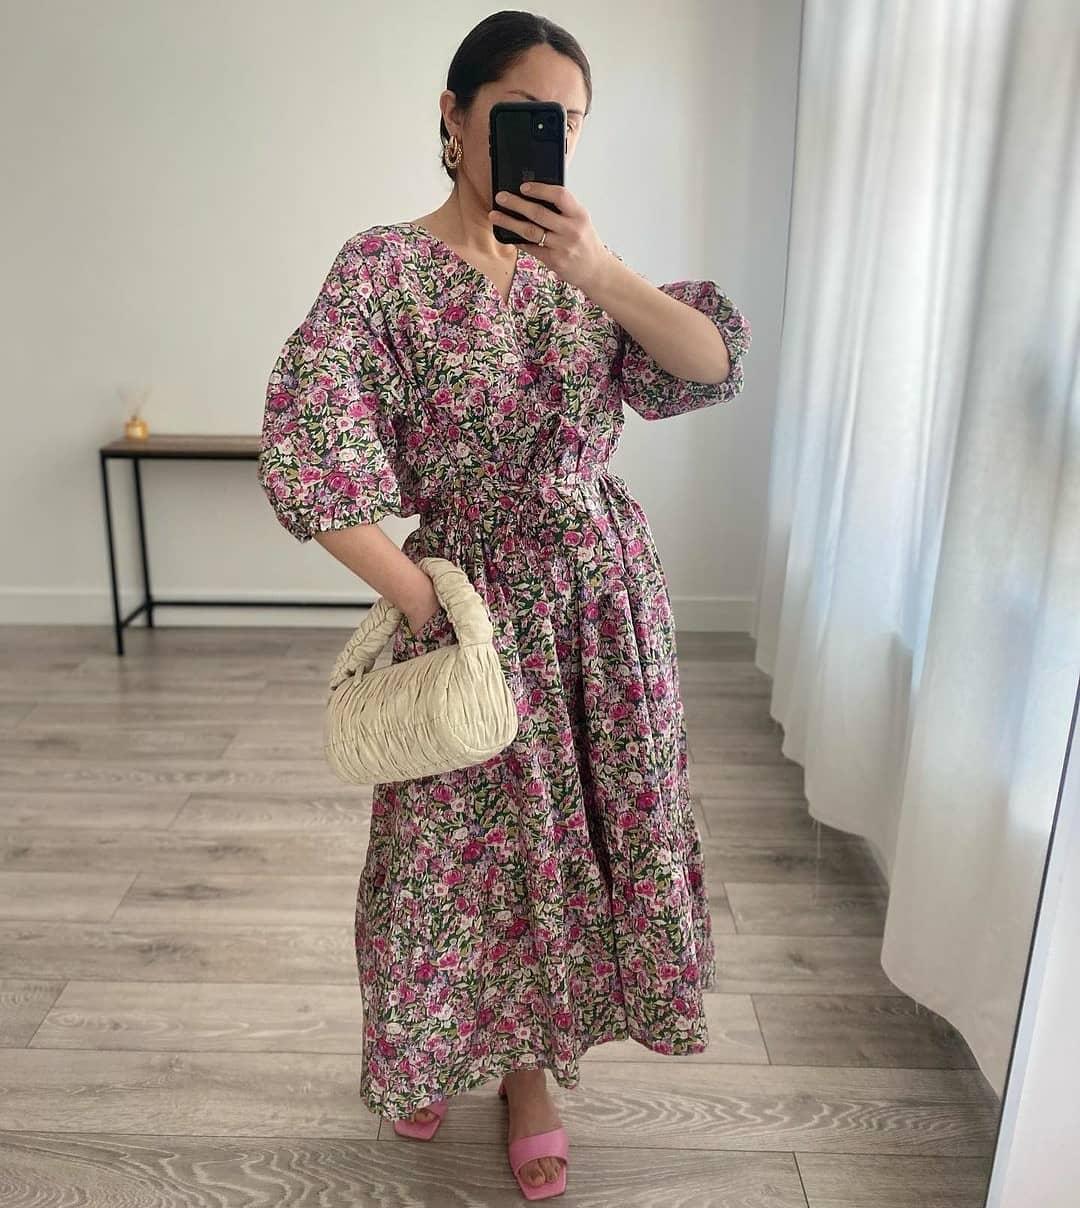 dress linda de Mango sur mangooutfits